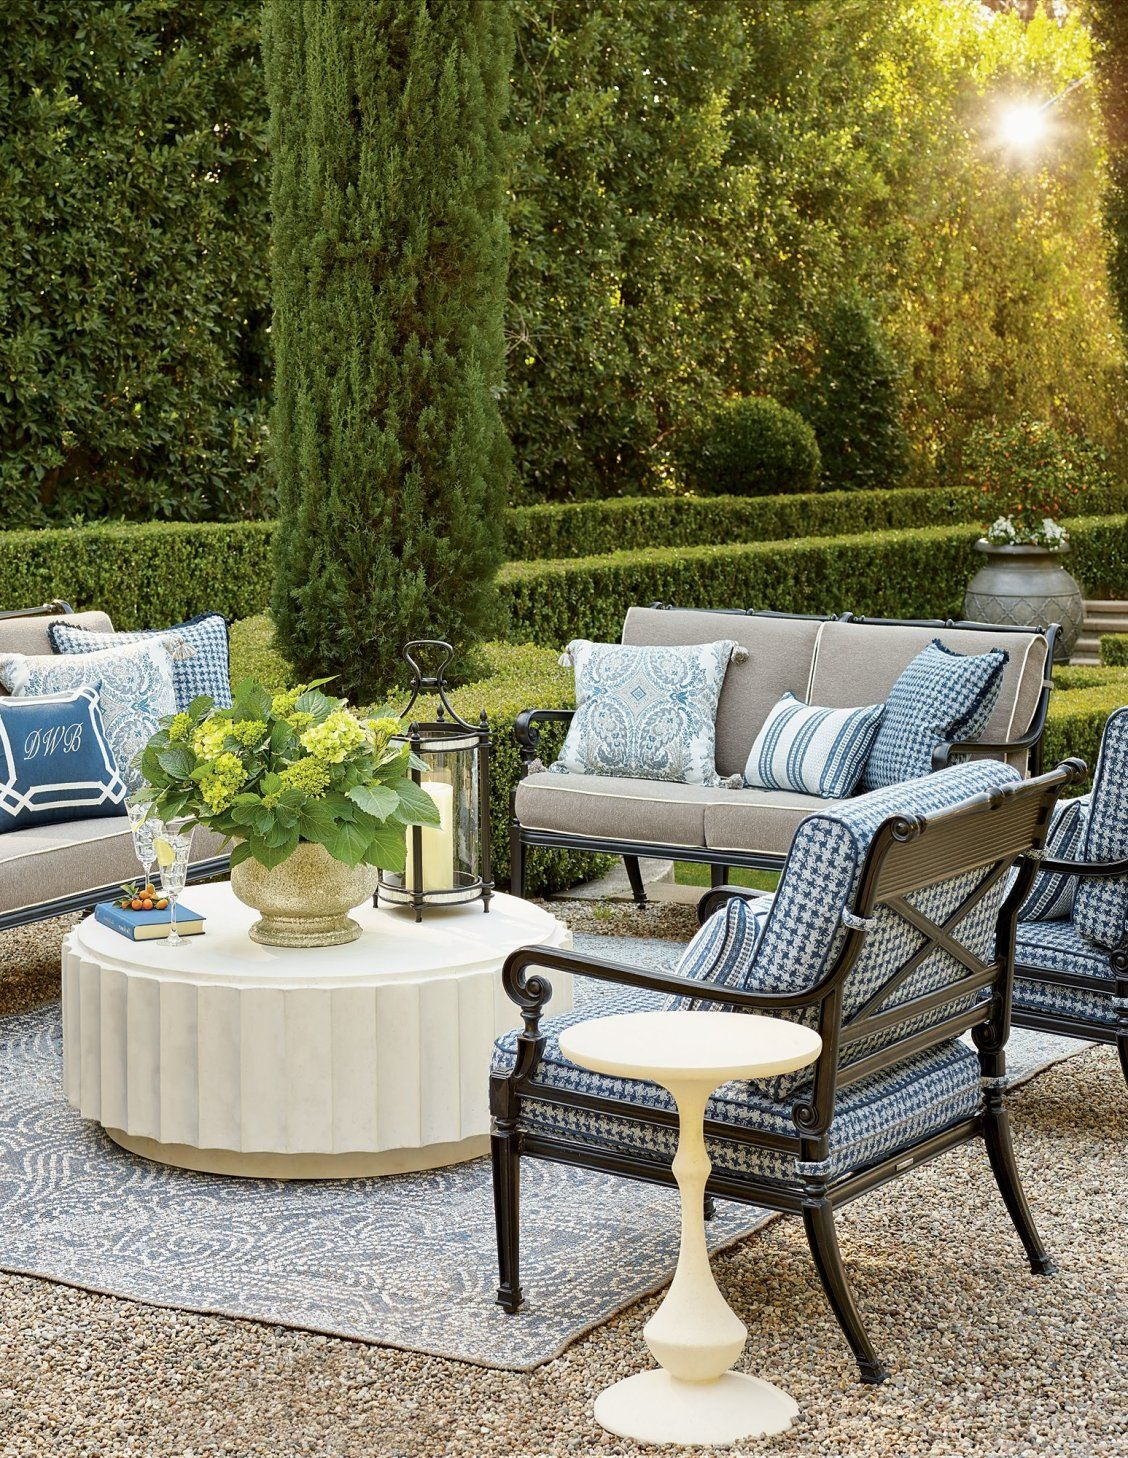 Carlisle Seating in Onyx Finish | Fine furniture design ... on Fine Living Patio Set id=53040